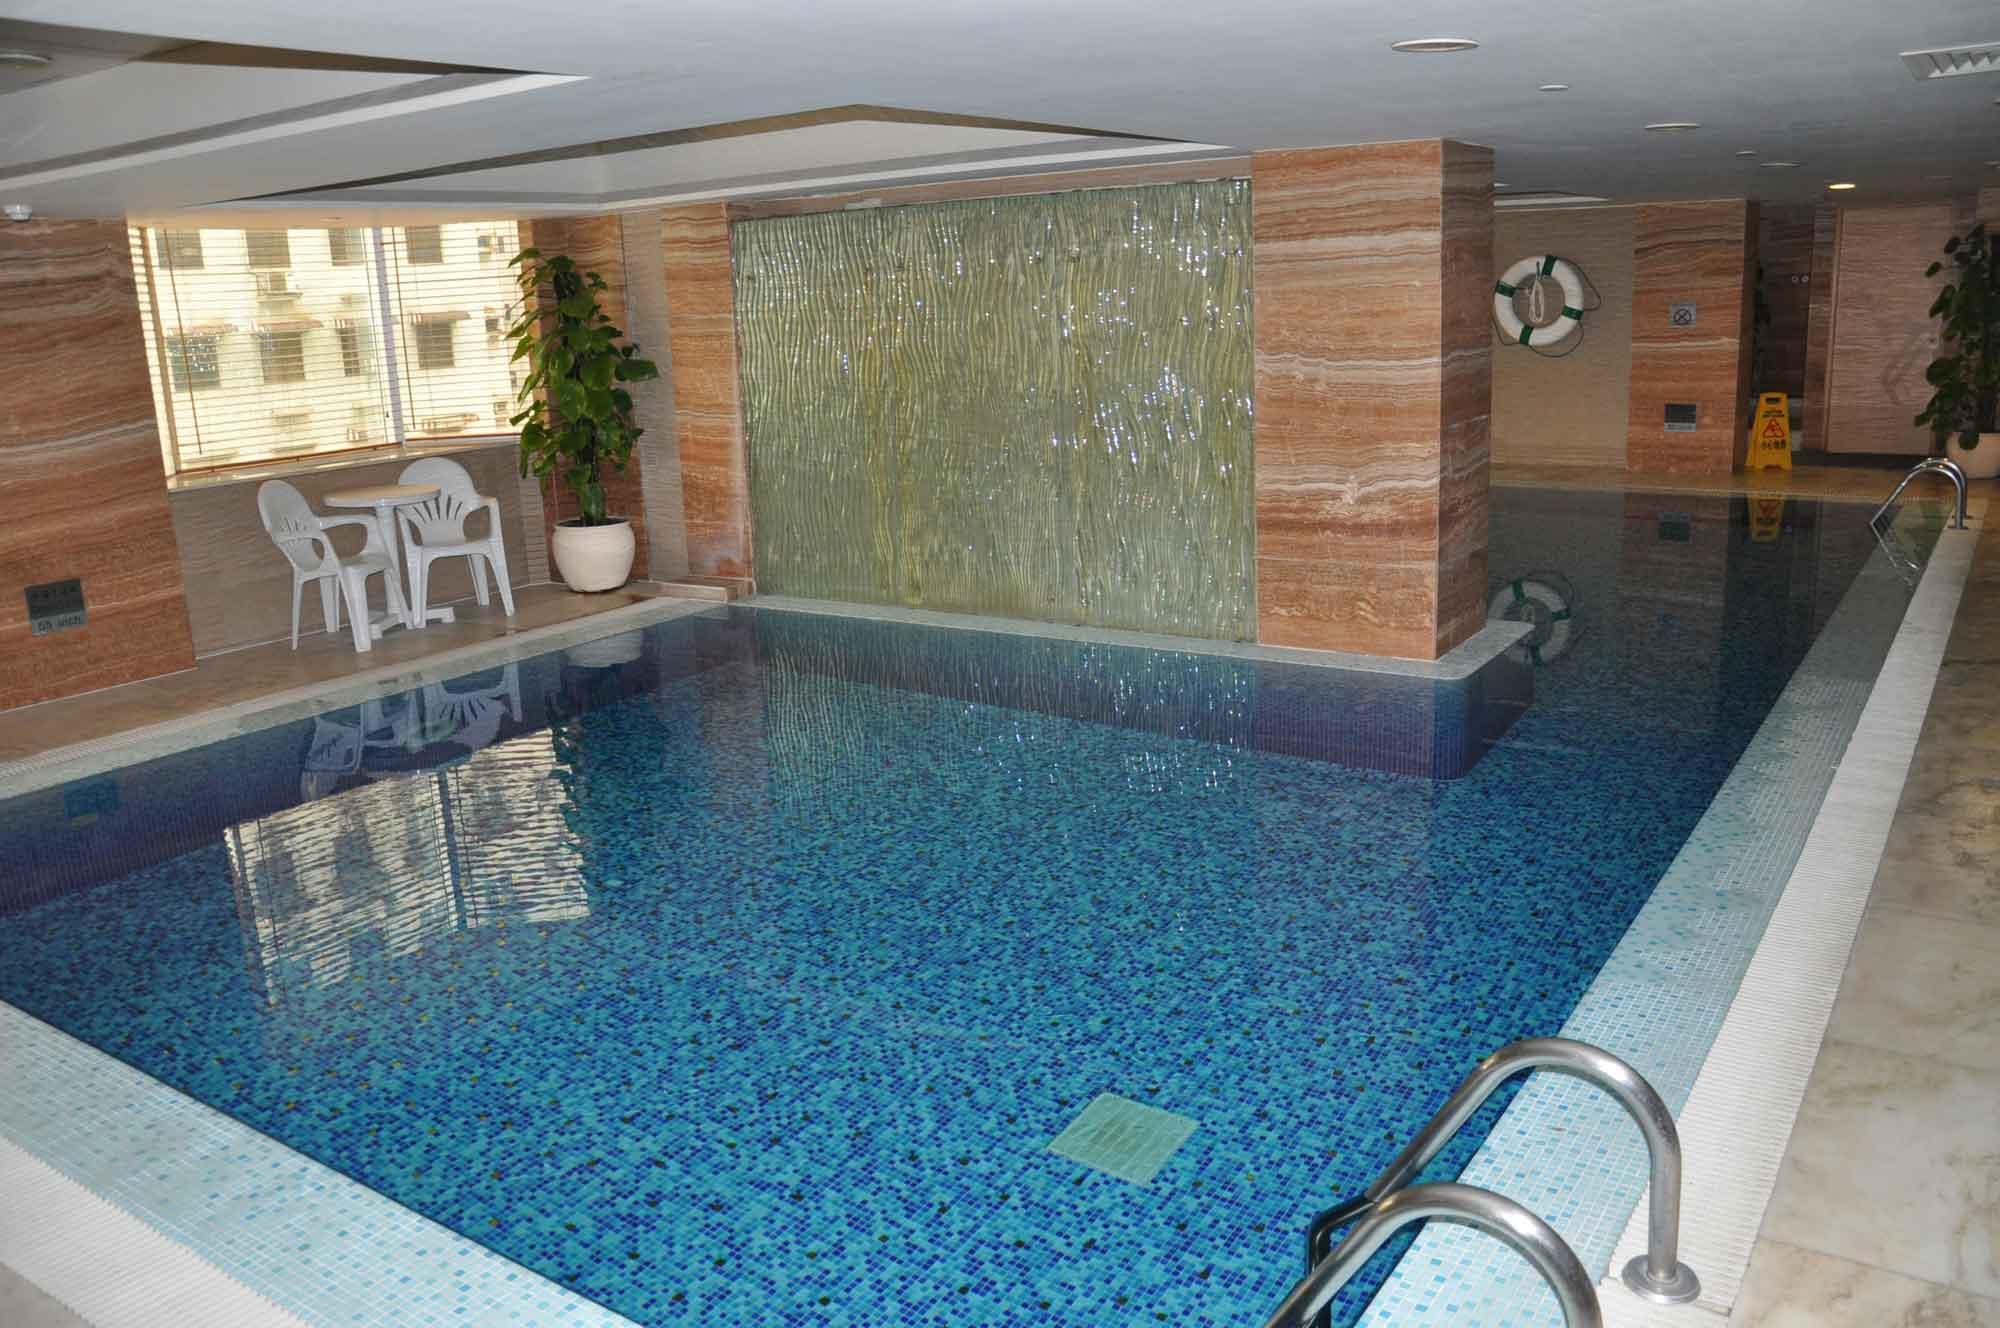 Holiday Inn Macau pool